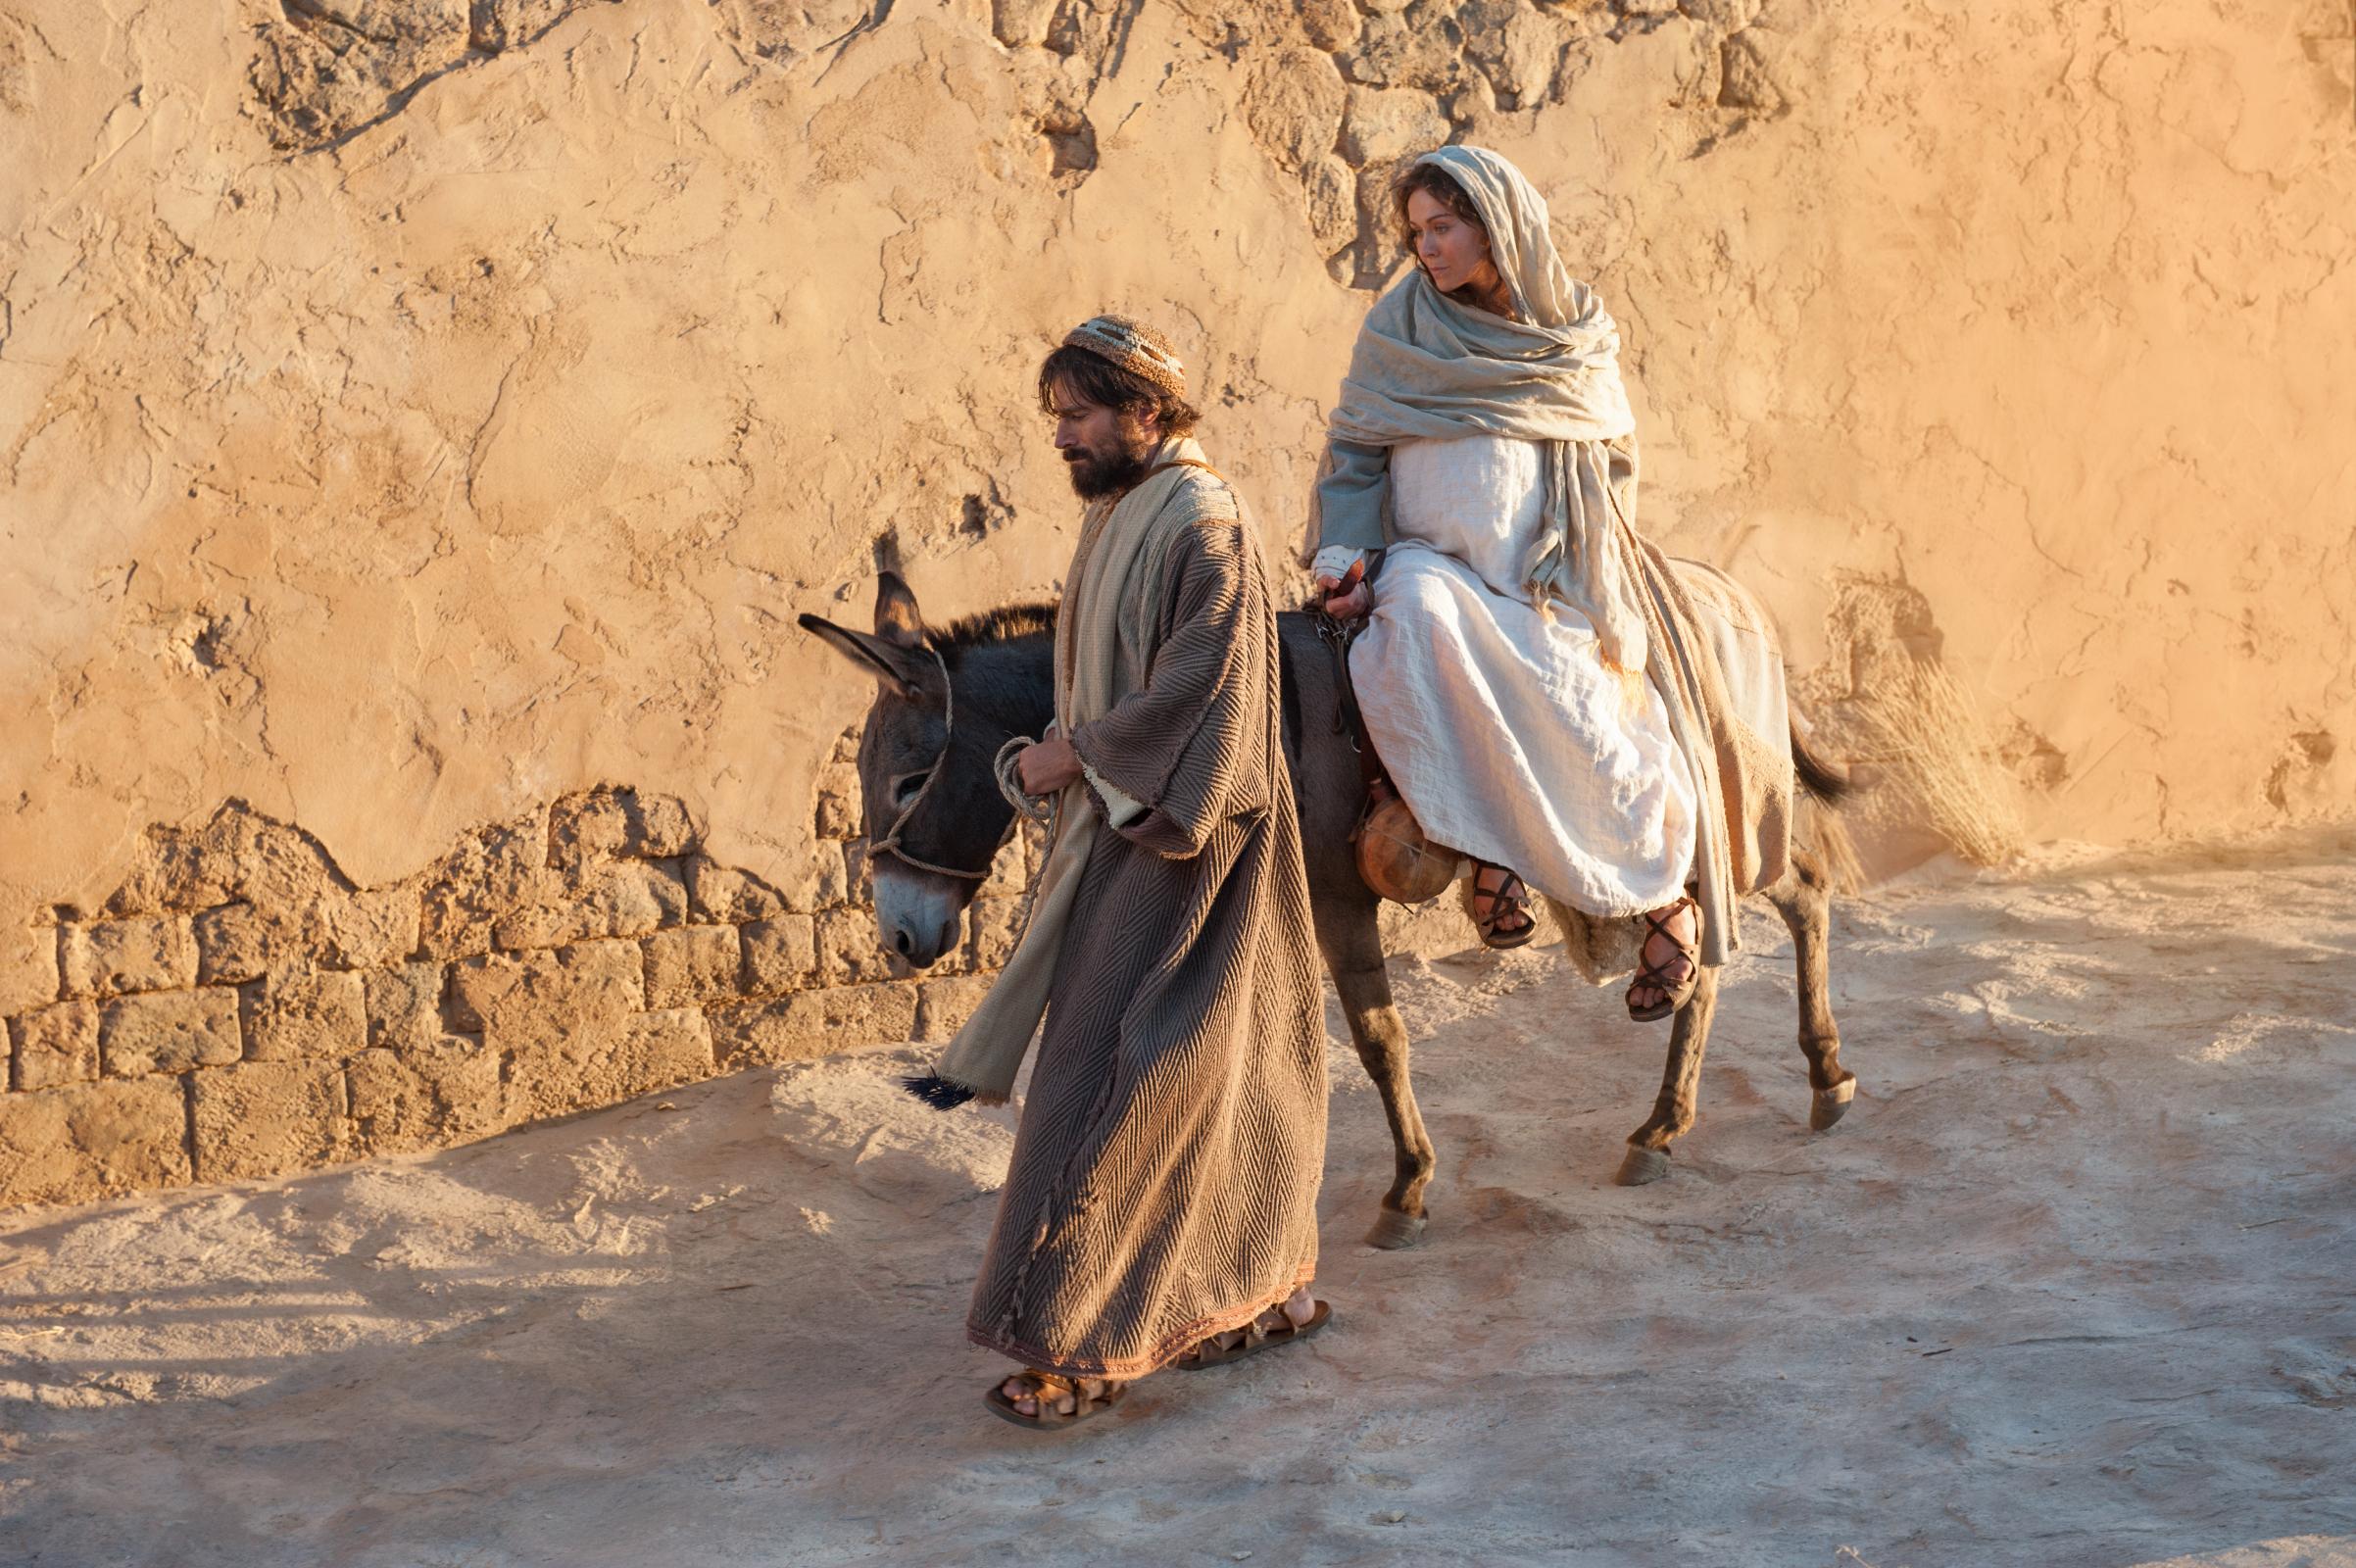 nativity jesus christ lds wallpaper - photo #17